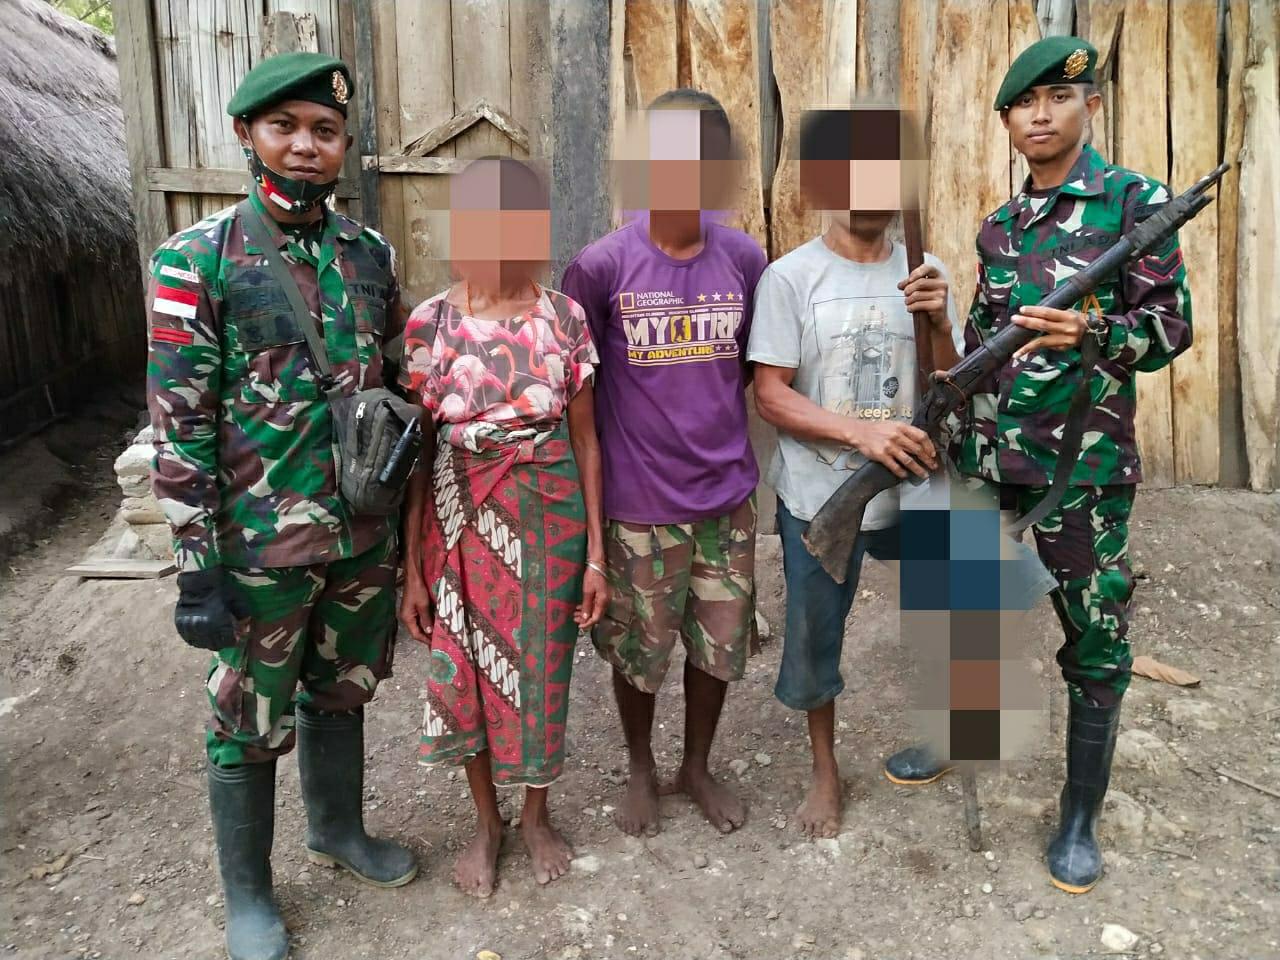 Satgas Pamtas Yonarmed 6/3 Kostrad Terima Satu Pucuk Senjata Api di Pos Oepoli Sungai.